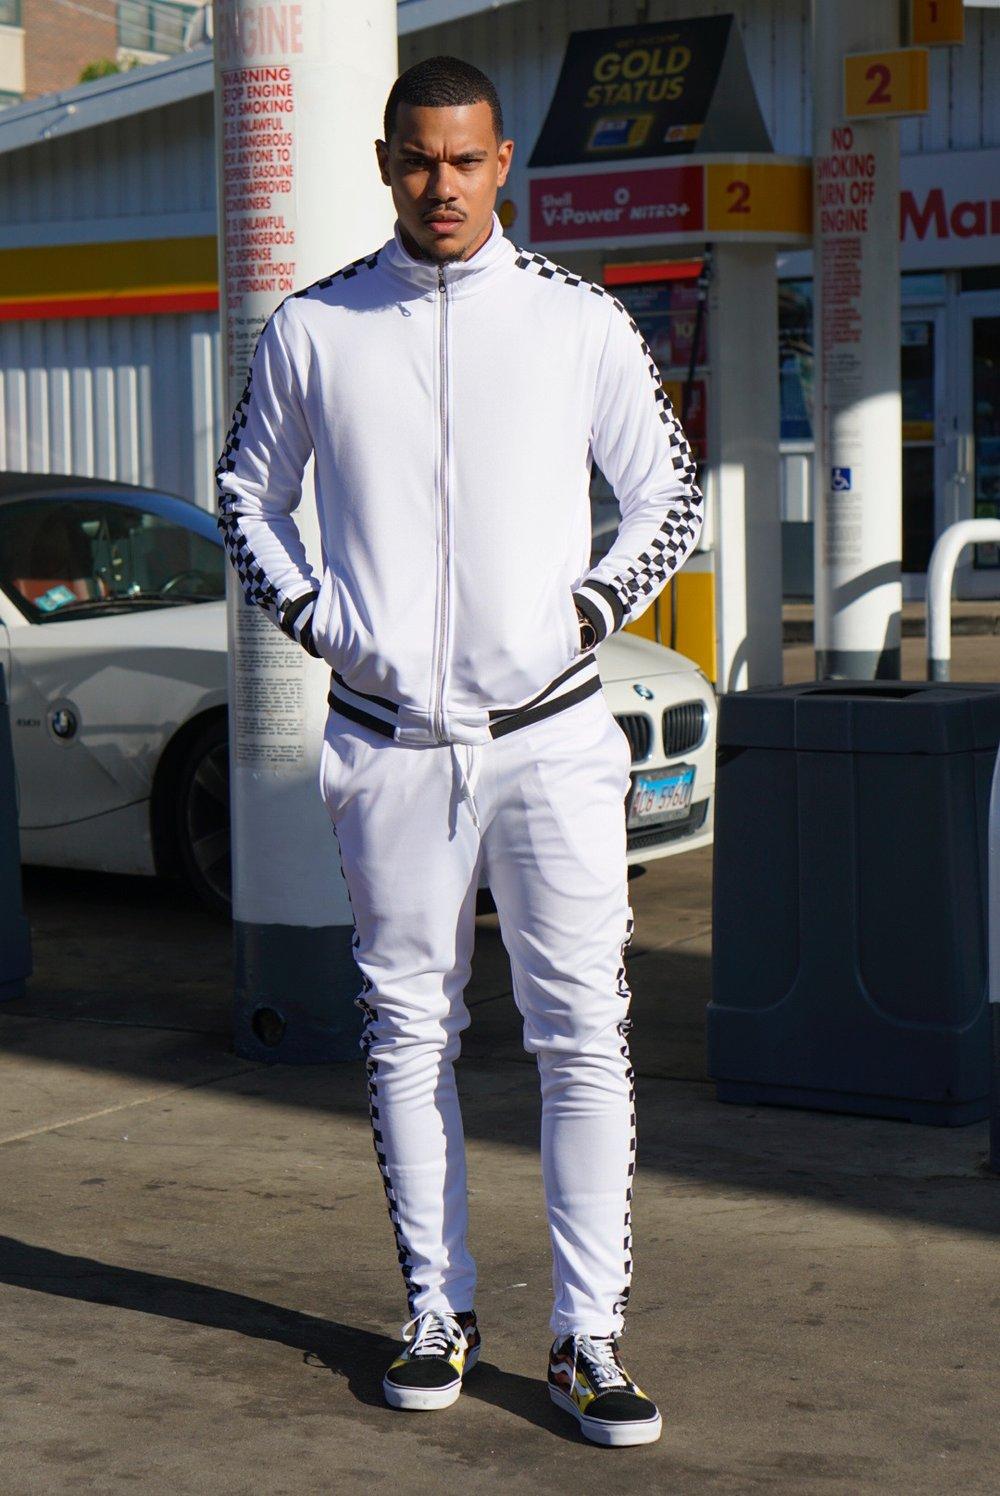 Image of Mens Leisurewear- White/Black